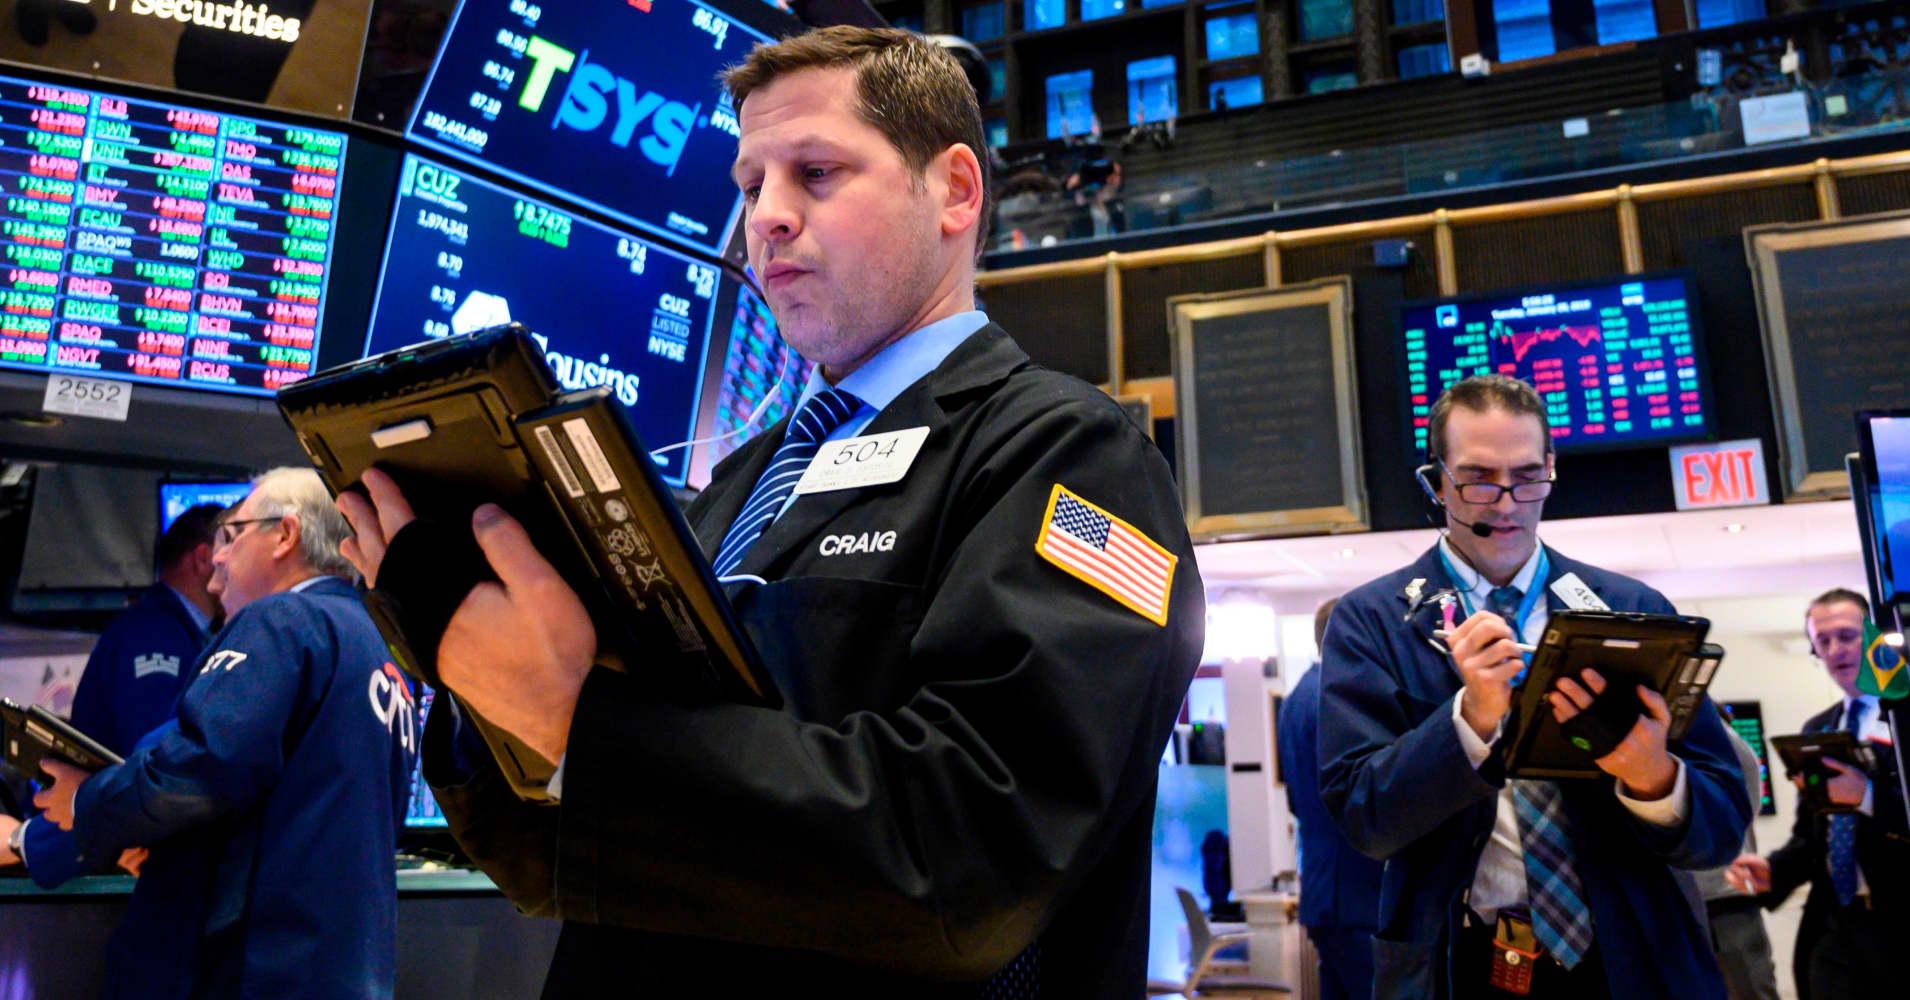 Stocks making the biggest moves premarket: Tesla, Coca-Cola, Twitter, Verizon, Hasbro & more